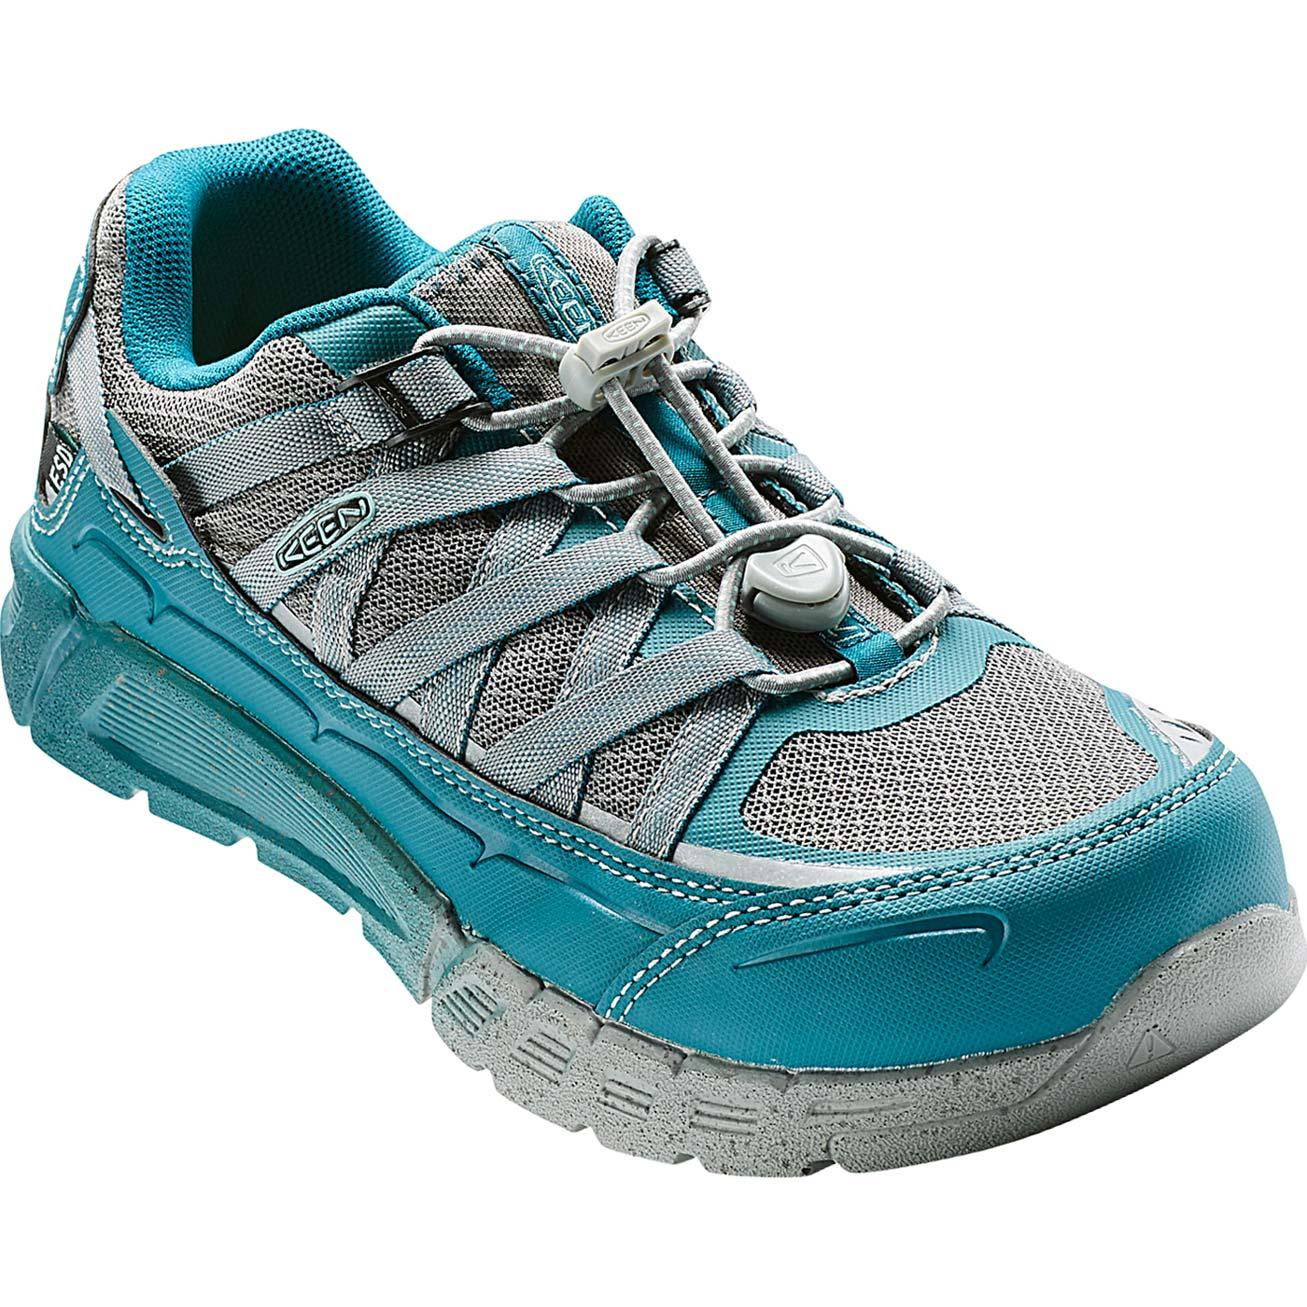 5fadcd0ab4d058 KEEN Utility® Asheville Women s Aluminum Toe Static-Dissipative Work  Athletic Shoe